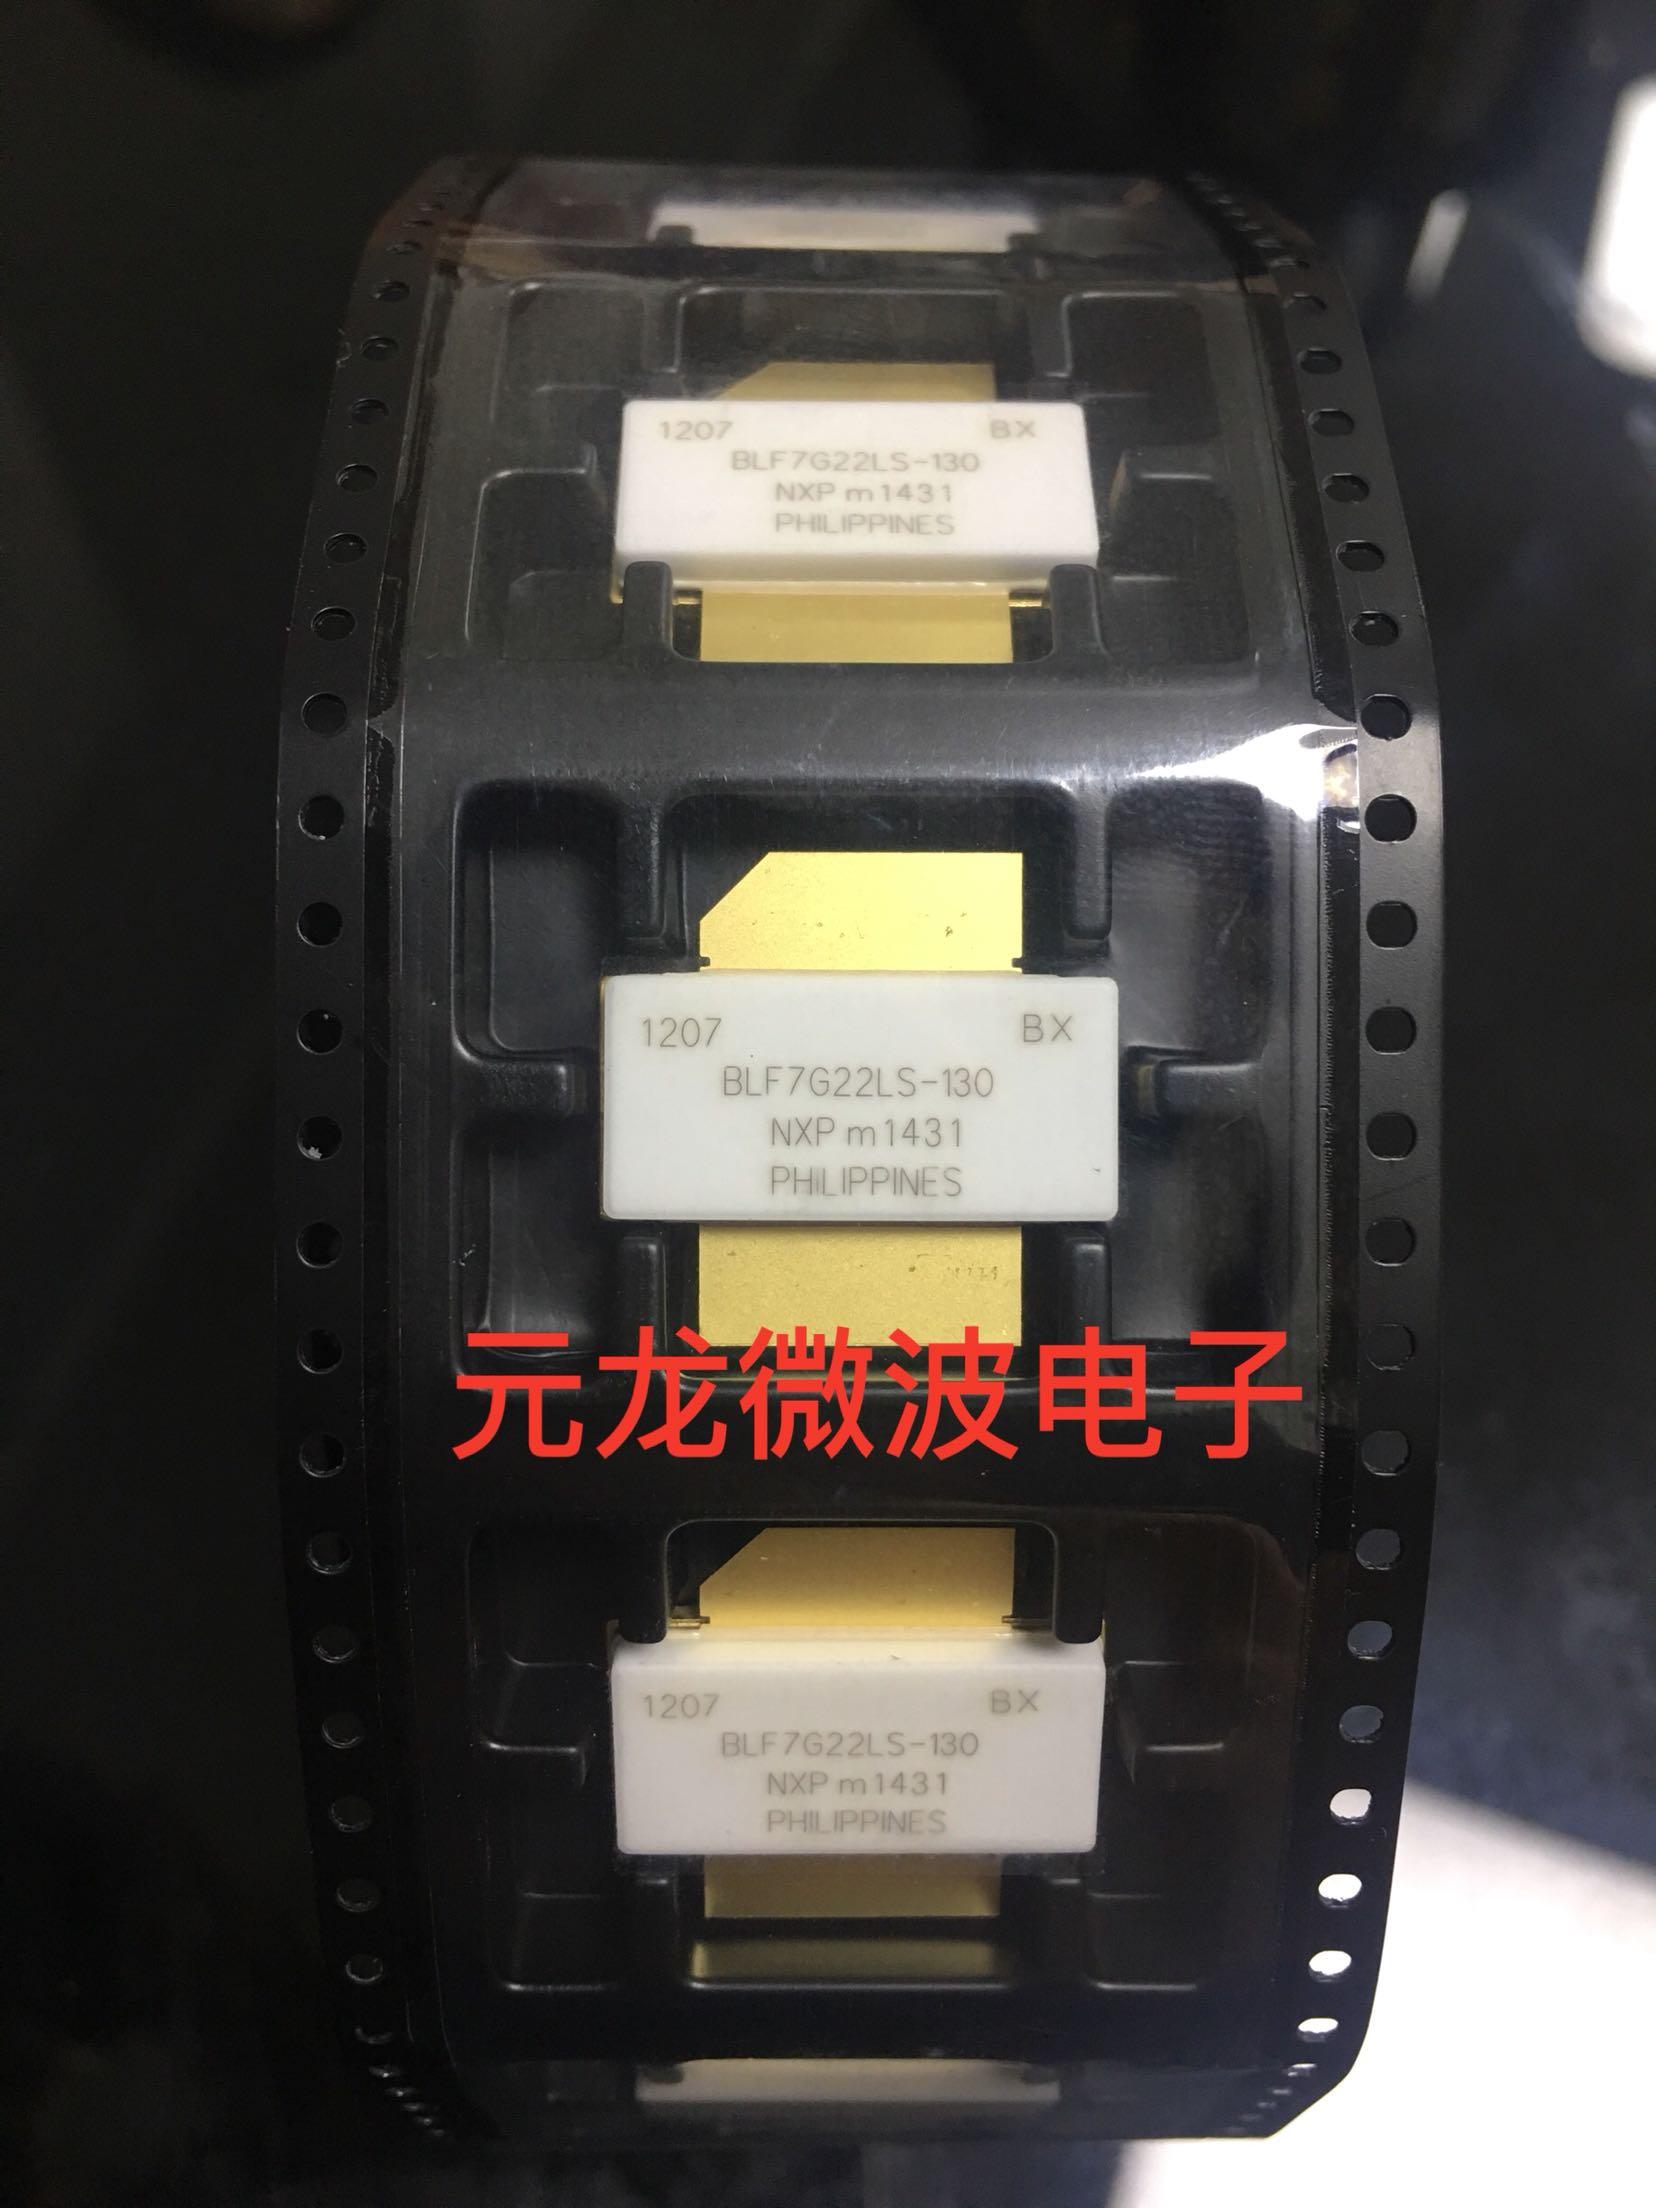 BLF7G22LS-130